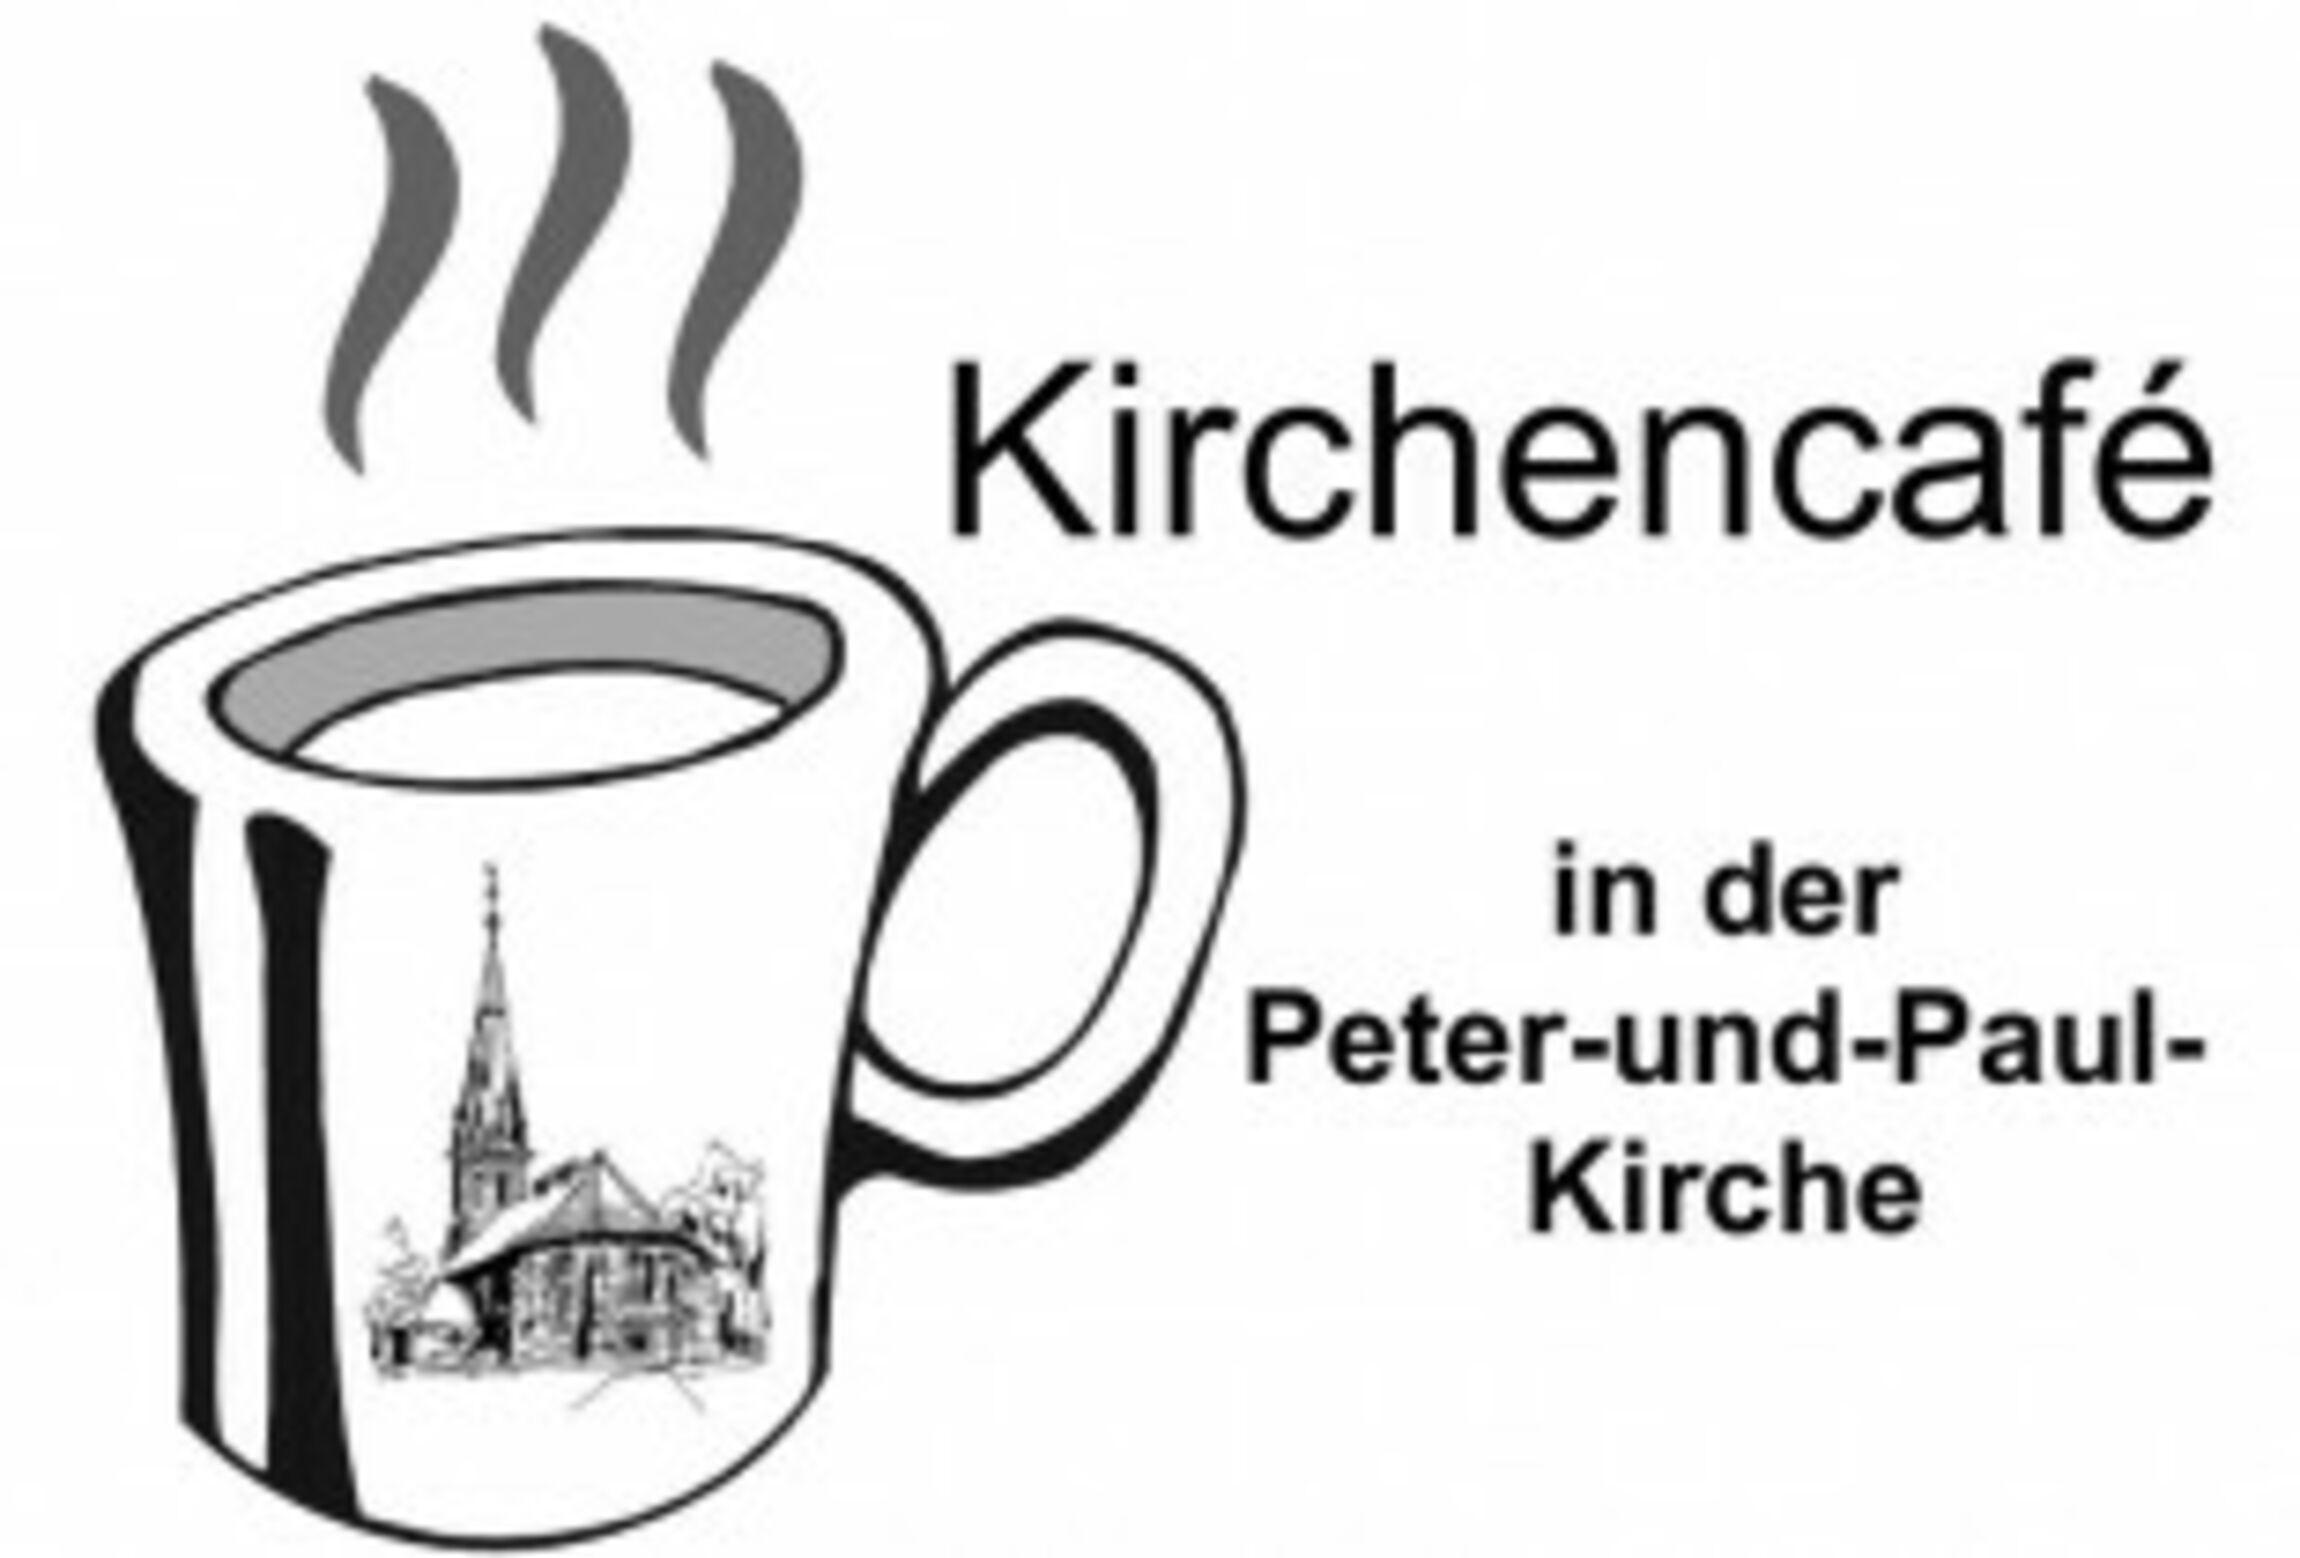 Kirchencafe Logo